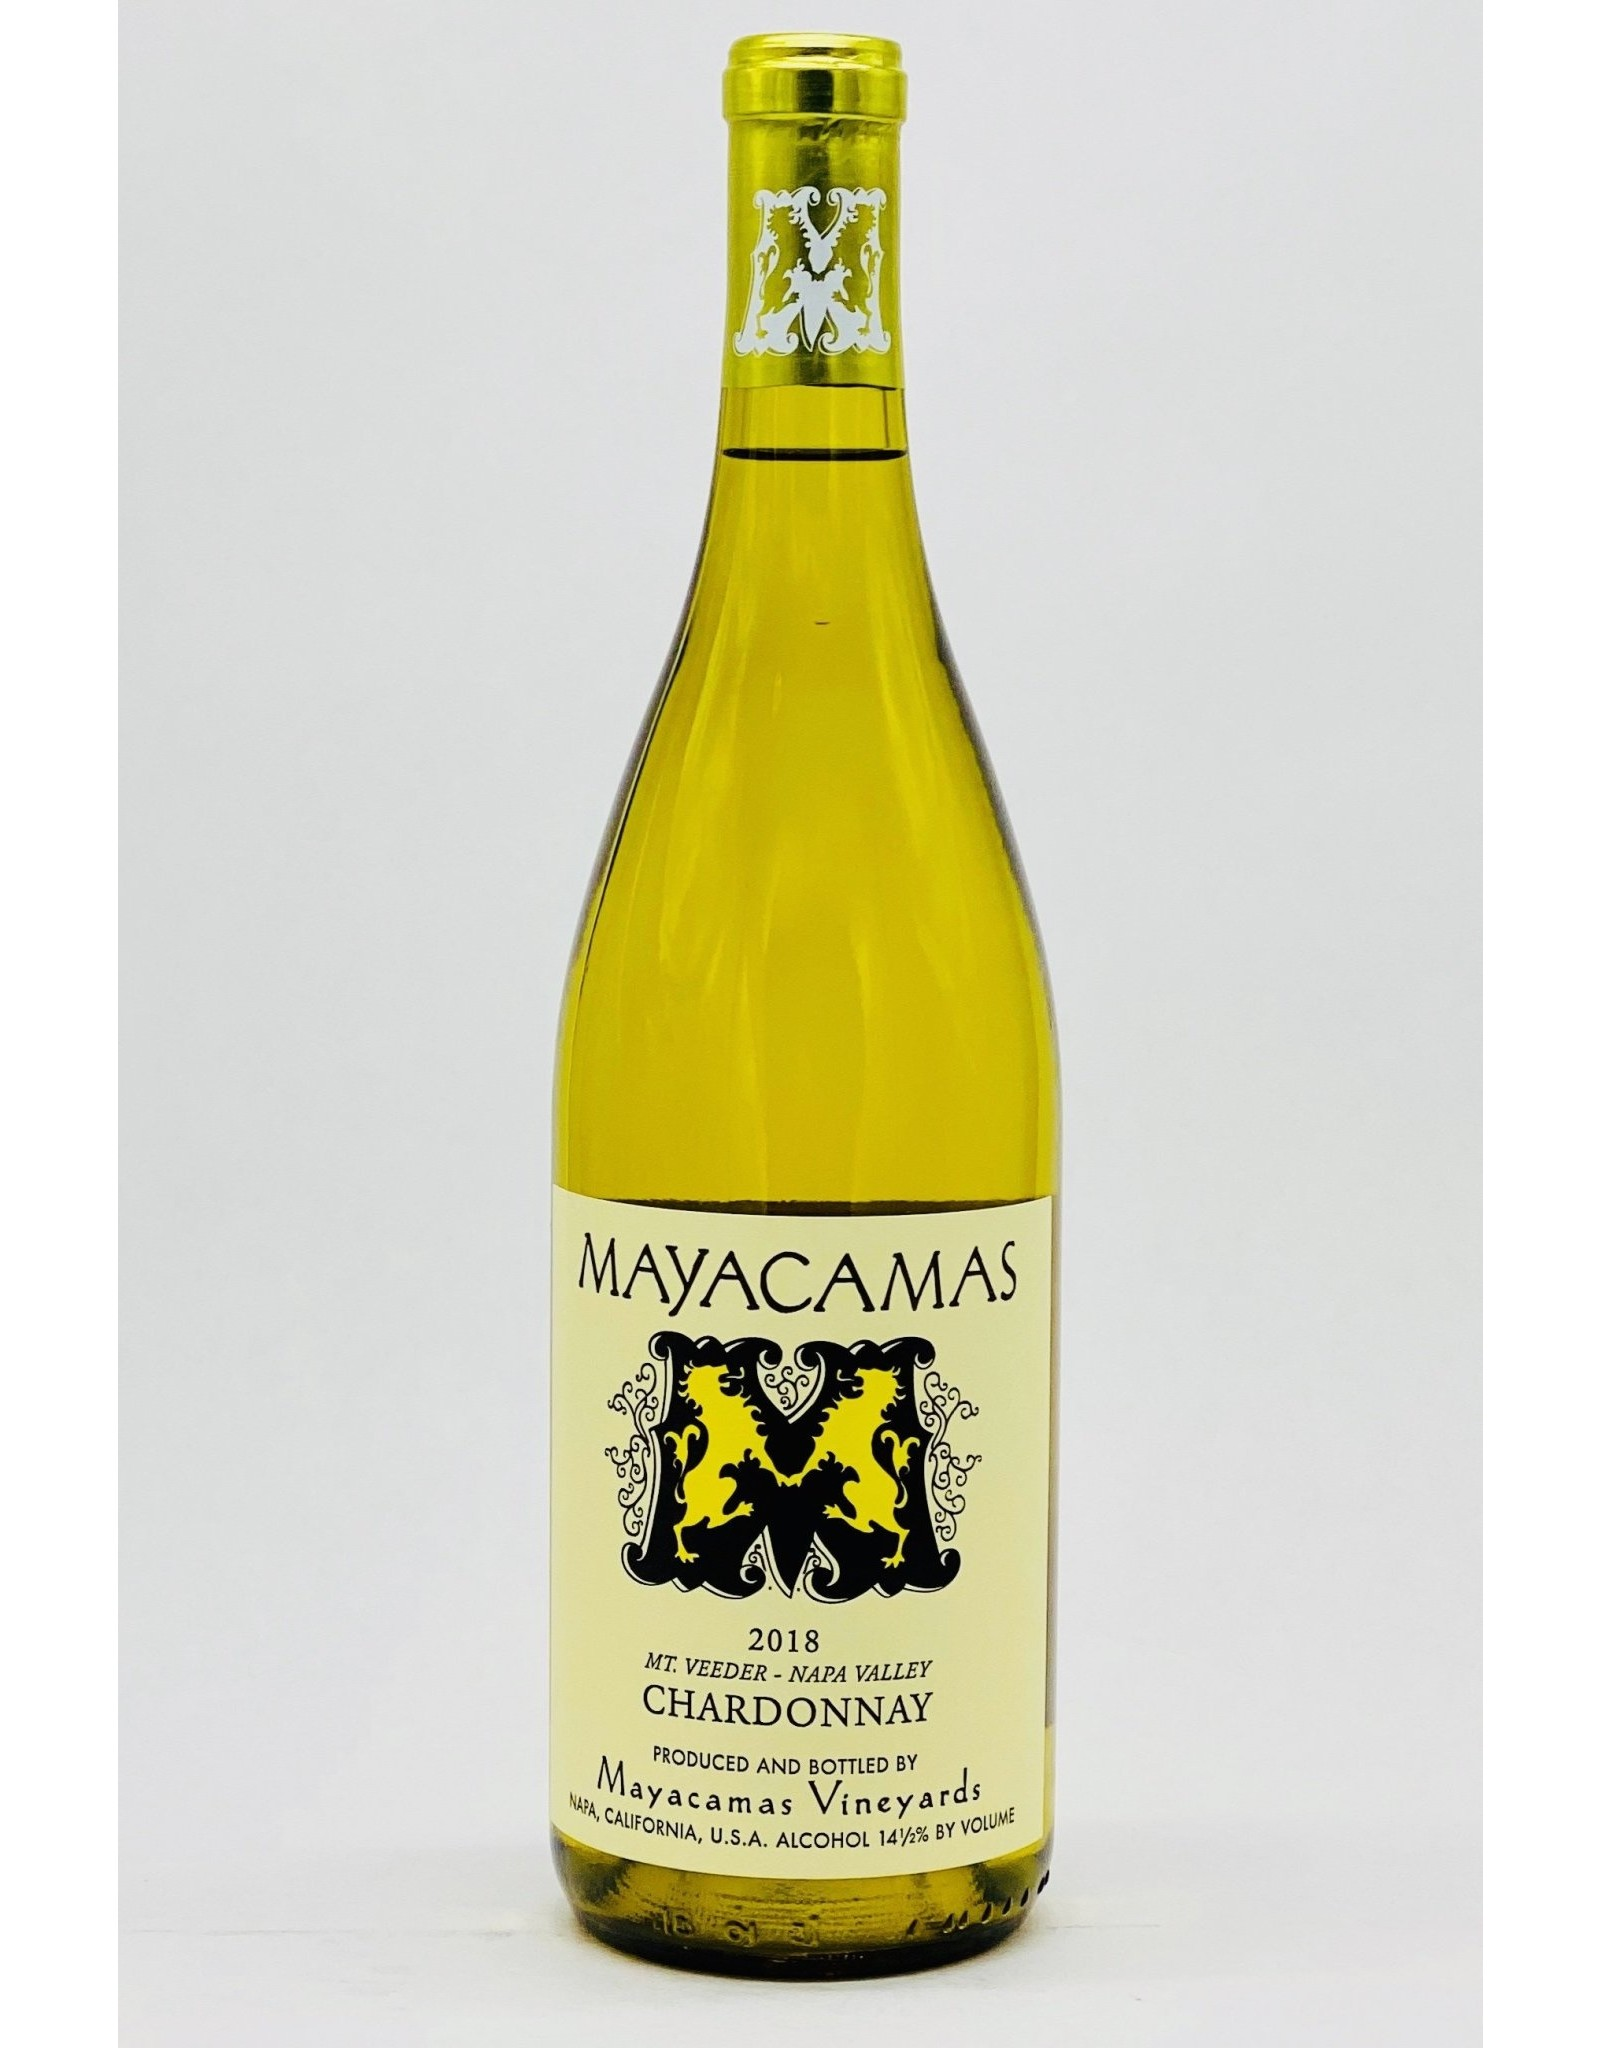 Mayacamas Mayacamas Chardonnay, Mt. Veeder 2018